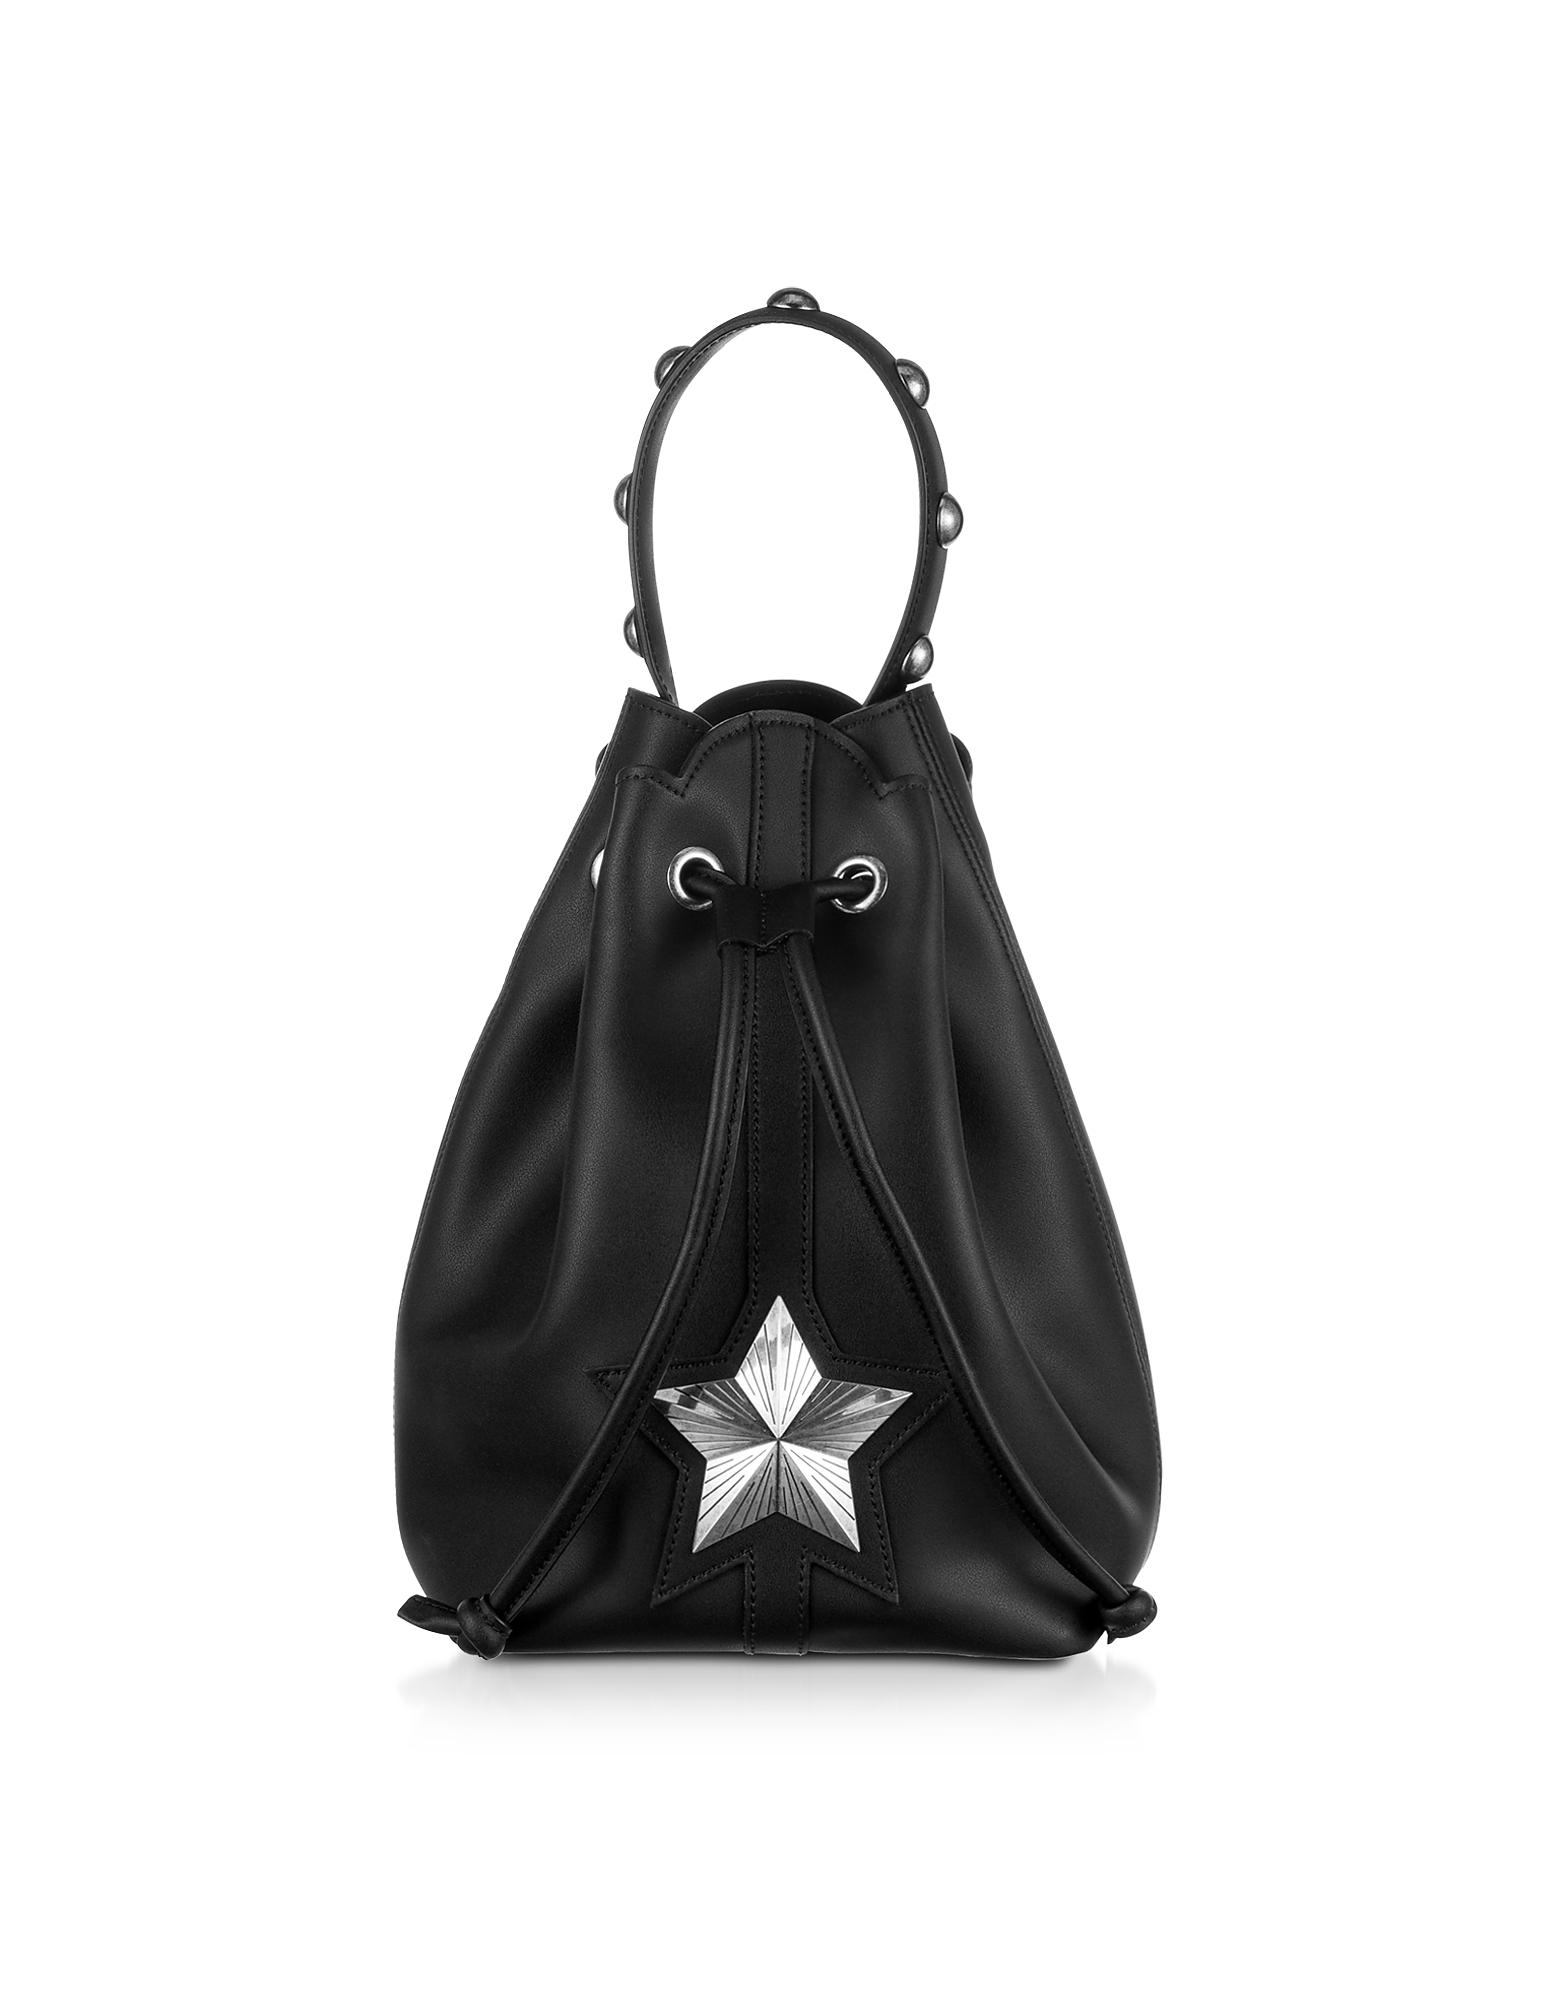 Les Jeunes Etoiles Designer Handbags, Black Leather Vega Bucket Bag